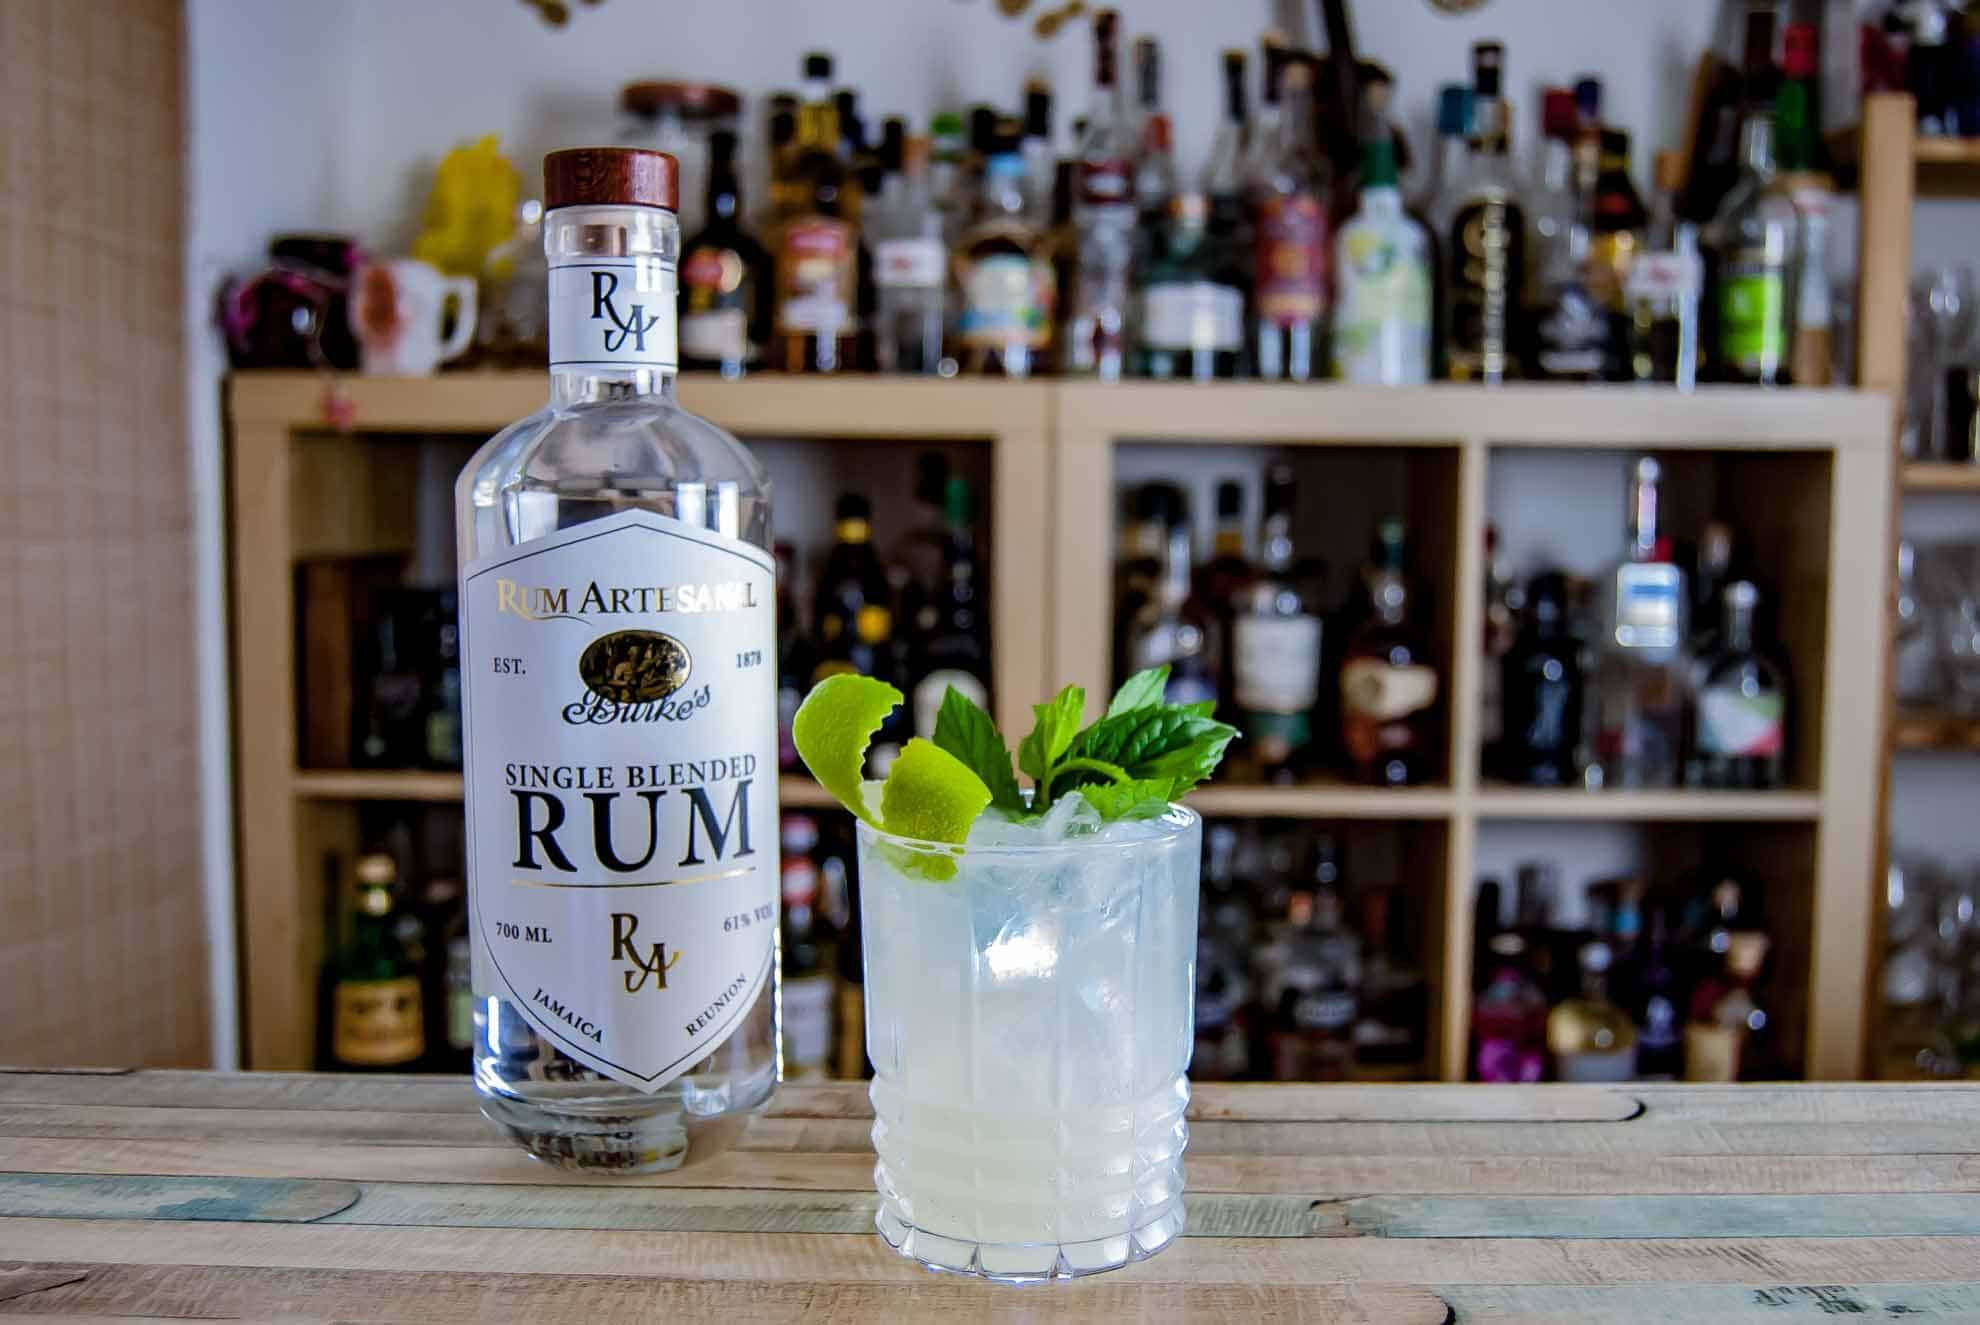 Ein Mojito mit Rum Artesanal Burke's White Single Blended Rum.